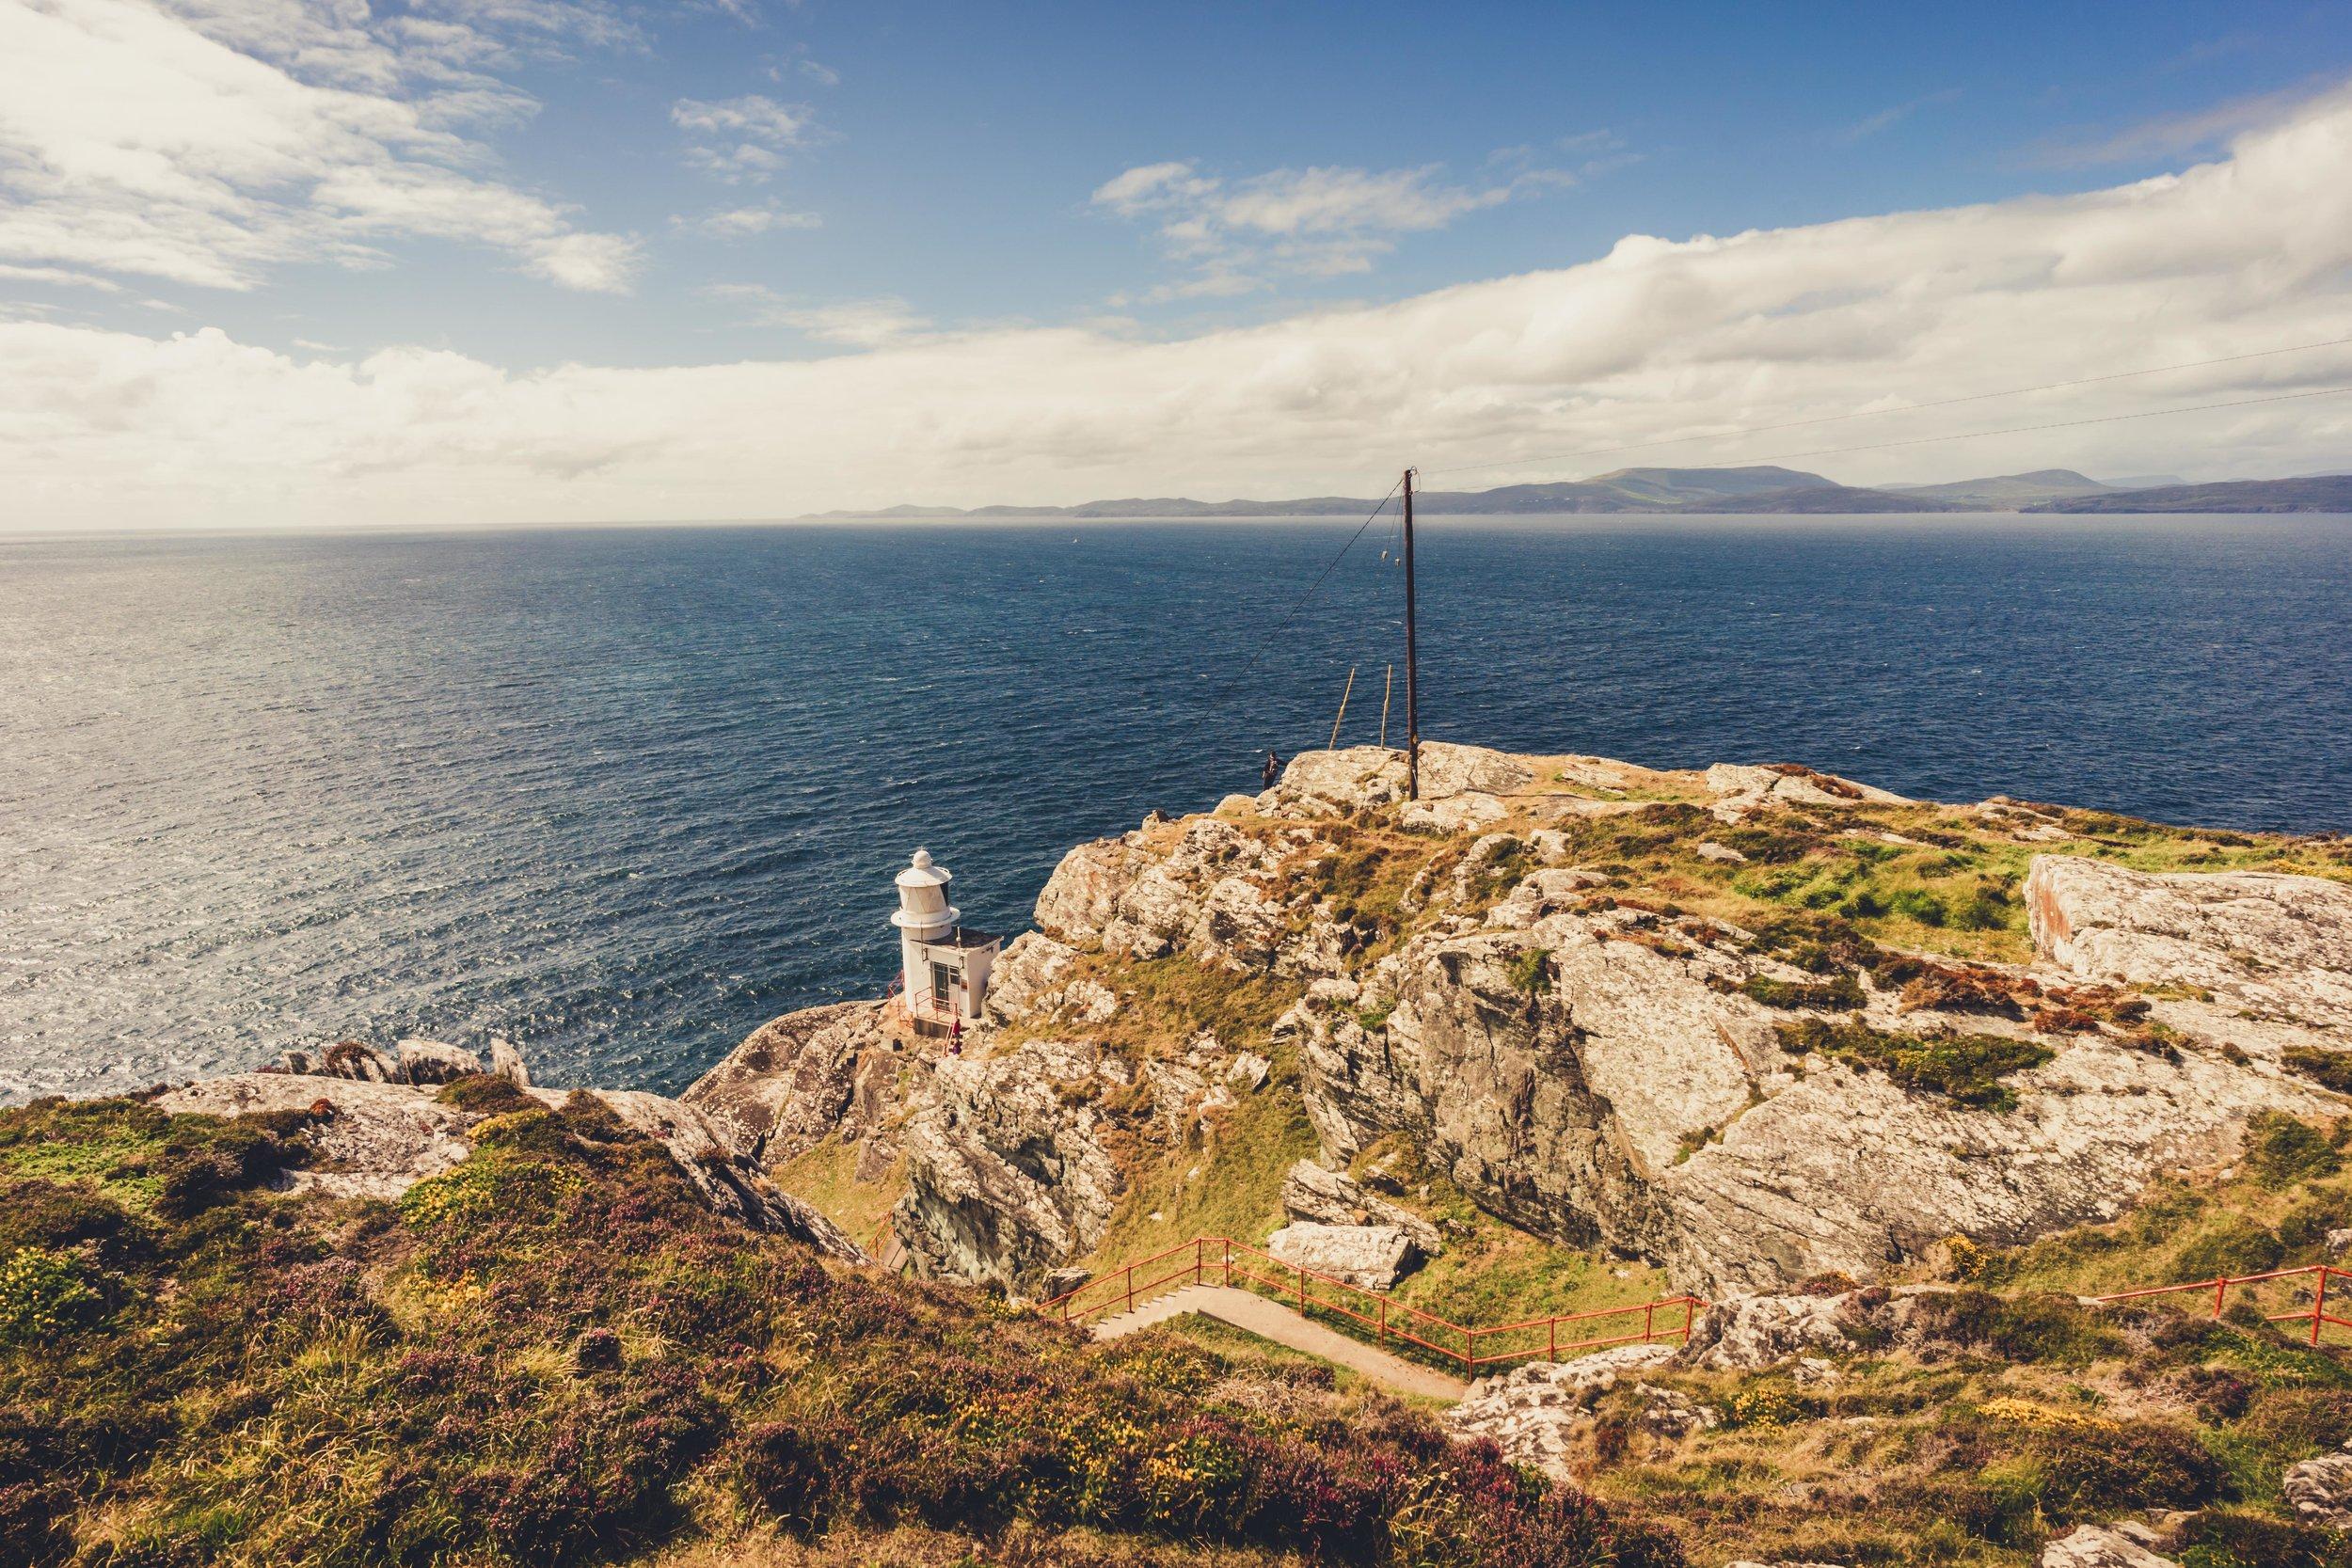 county cork. cork. ireland. irish. history. city. house sitting. old. travel. travel photography. travel photographer. lough hyne. hiking. outdoor. adventure. hiking. camping. sheeps head lighthouse.jpg